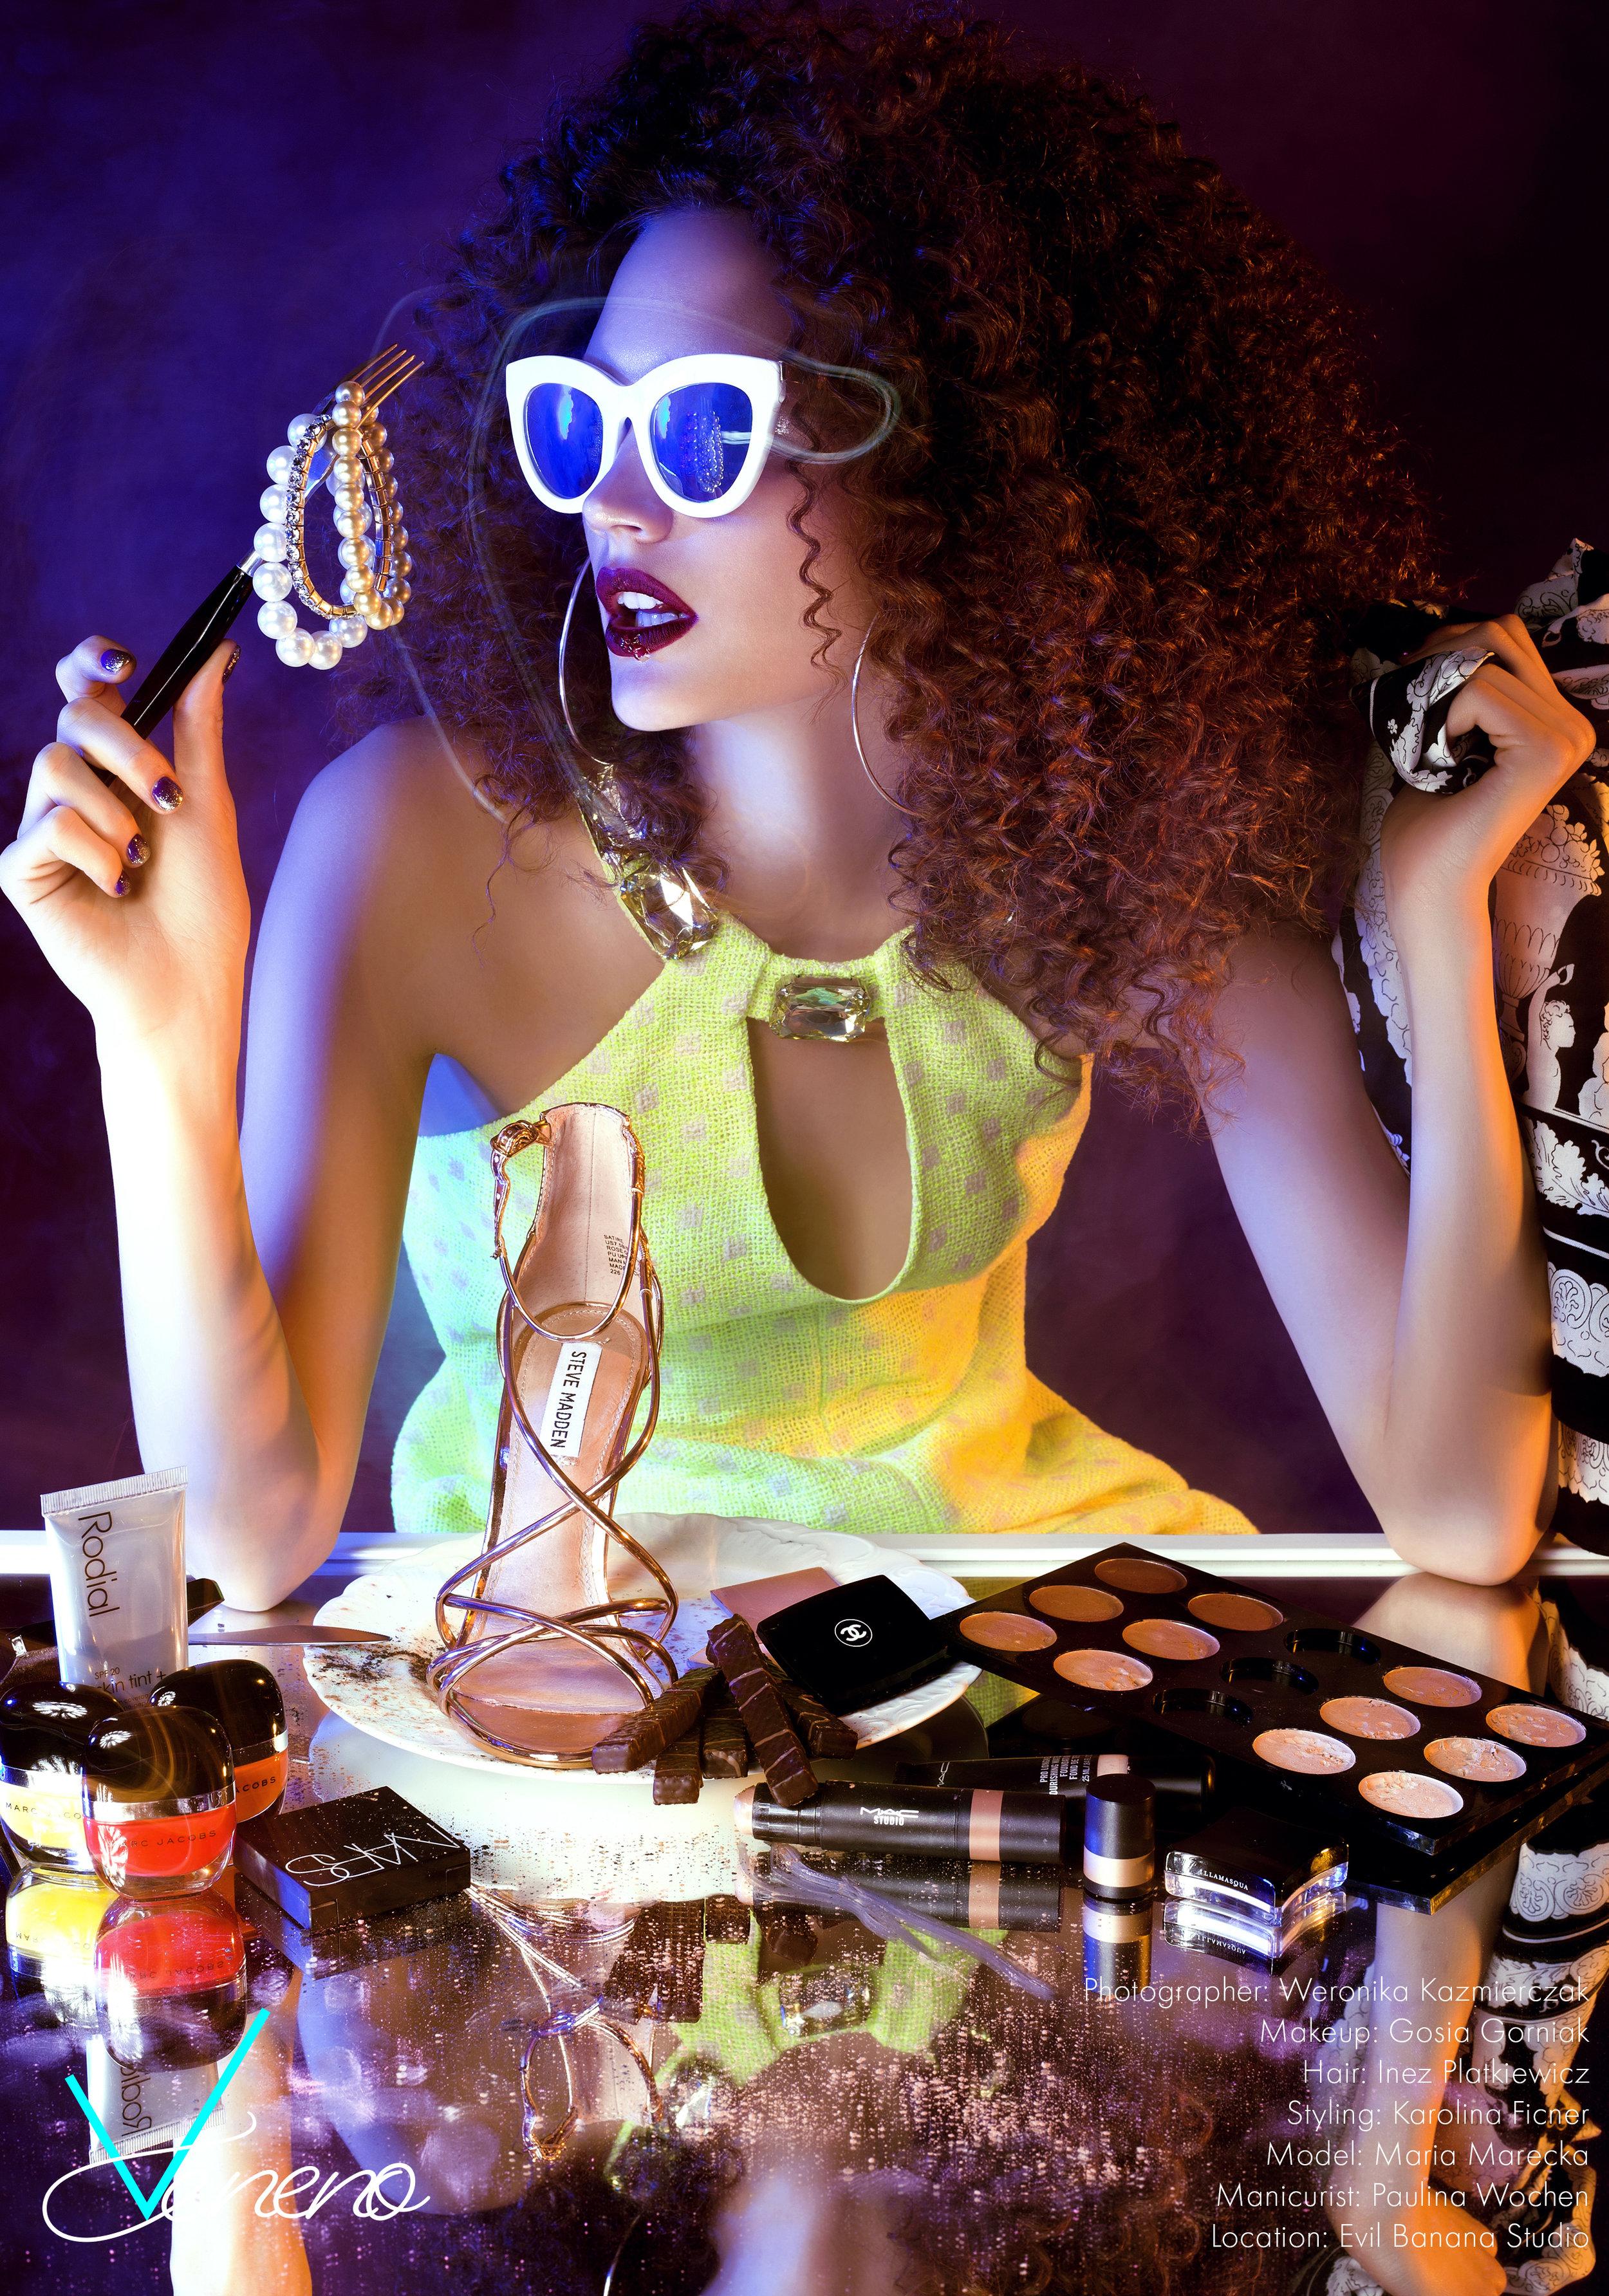 dress MOSCHINO sunglasses QUAY, earrings NATASHA SCHWEITZER, scarf VERSACE  (table) shoe STEVE MADDEN  MARC JACOBS nail polish RADIAL Skin Tint 01 Capri NARS Dual Intensity Blush MAC Pro Longwear foundation; Quiktrik Stick CHANEL Ombre Essentielle eyeshadow ILLAMASQUA Pure pigment  COSMETICS: MAC Strobe Cream, PREP + PRIME ESSENTIAL OILS STICK YSL Touche Eclat 2,5 MAC Pro Longwear Foundation NC 15 TOM FORD Lipstick 10 Black Dahlia GIVENCHY Poudre Premiere Universal Nude MAC Studio Finish Concealer Duo TOM FORD Skin Illumination Powder Duo MAC Pro Beyond Twisted Lash Mascara